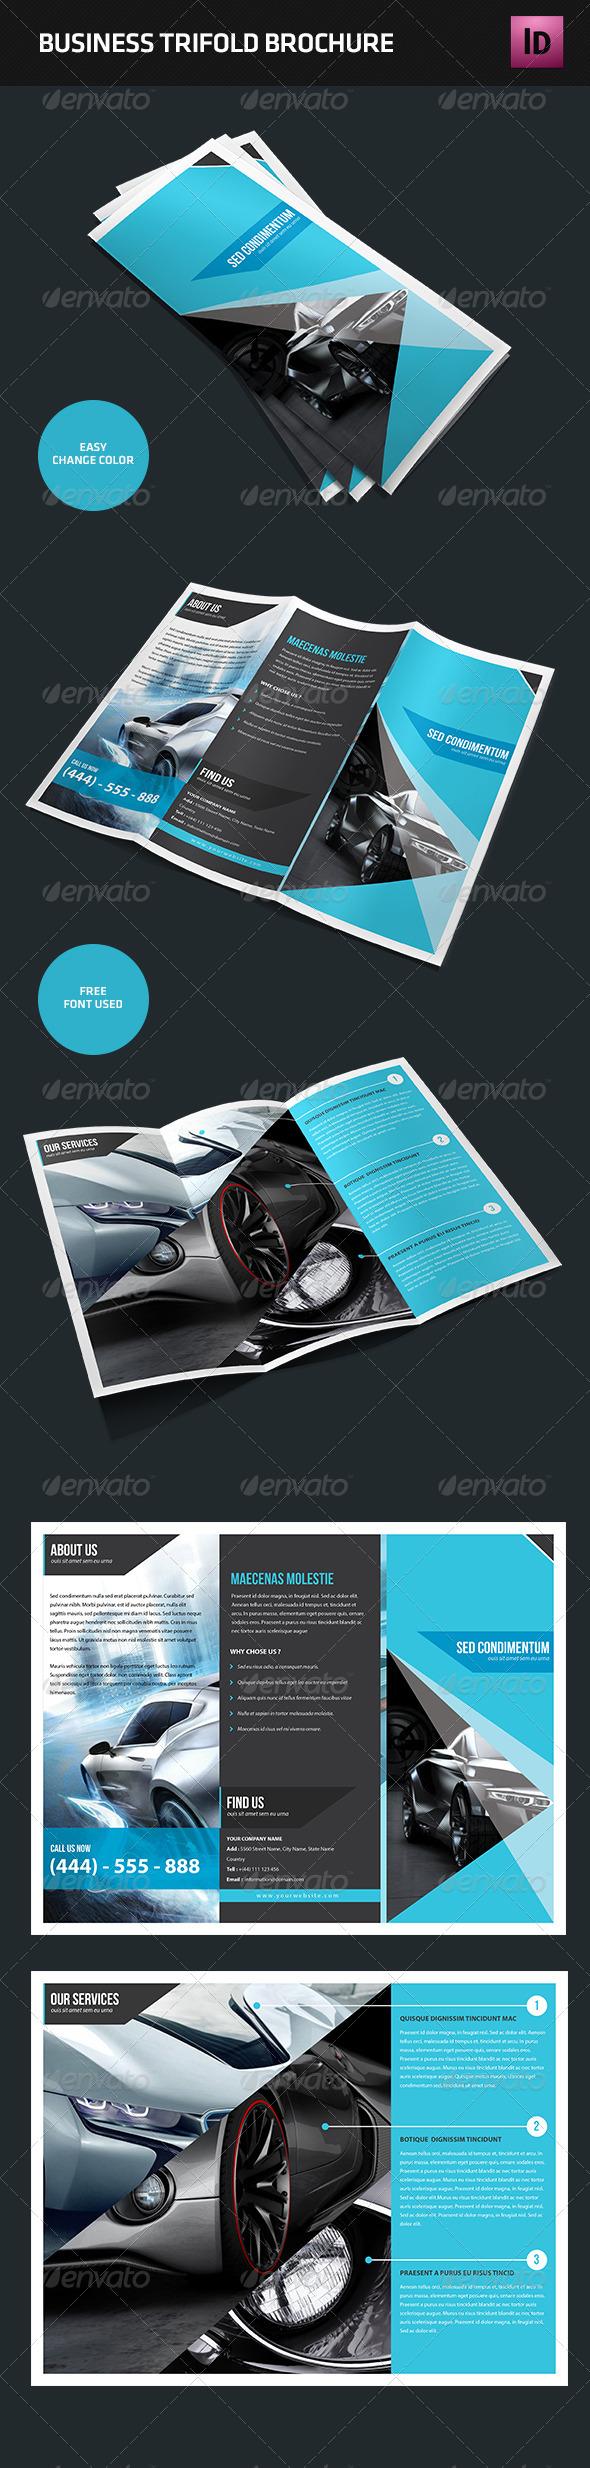 GraphicRiver Trifold Brochure 4512775